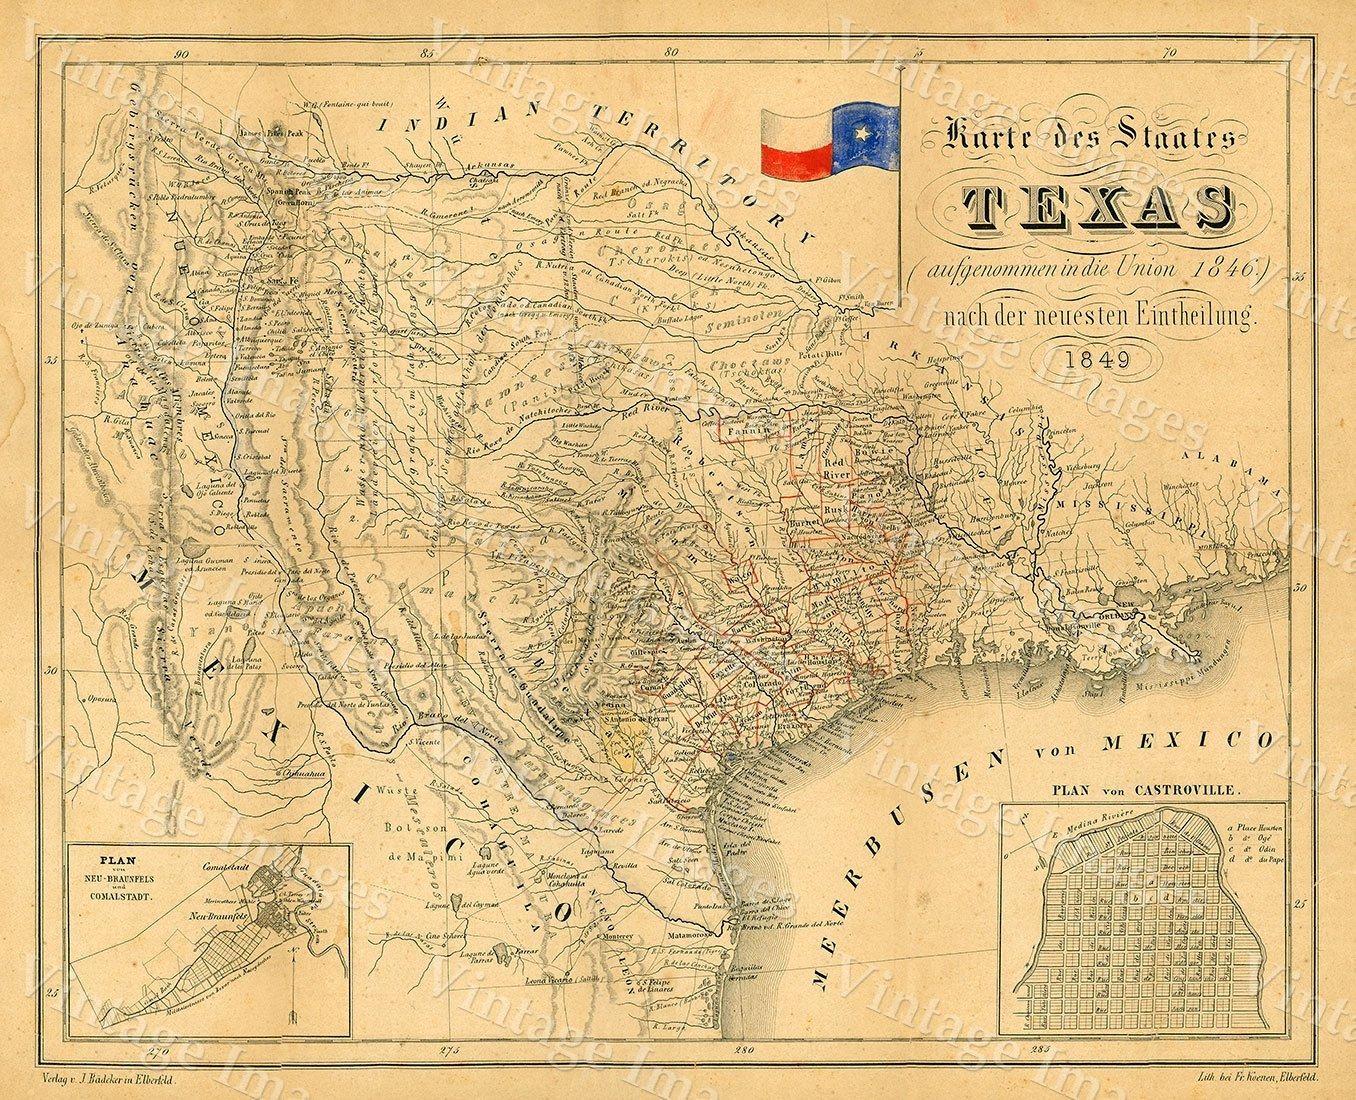 1849 Map Of Texas Old Texas Map, Texas, Map Of Texas, Vintage - Vintage Texas Maps For Sale